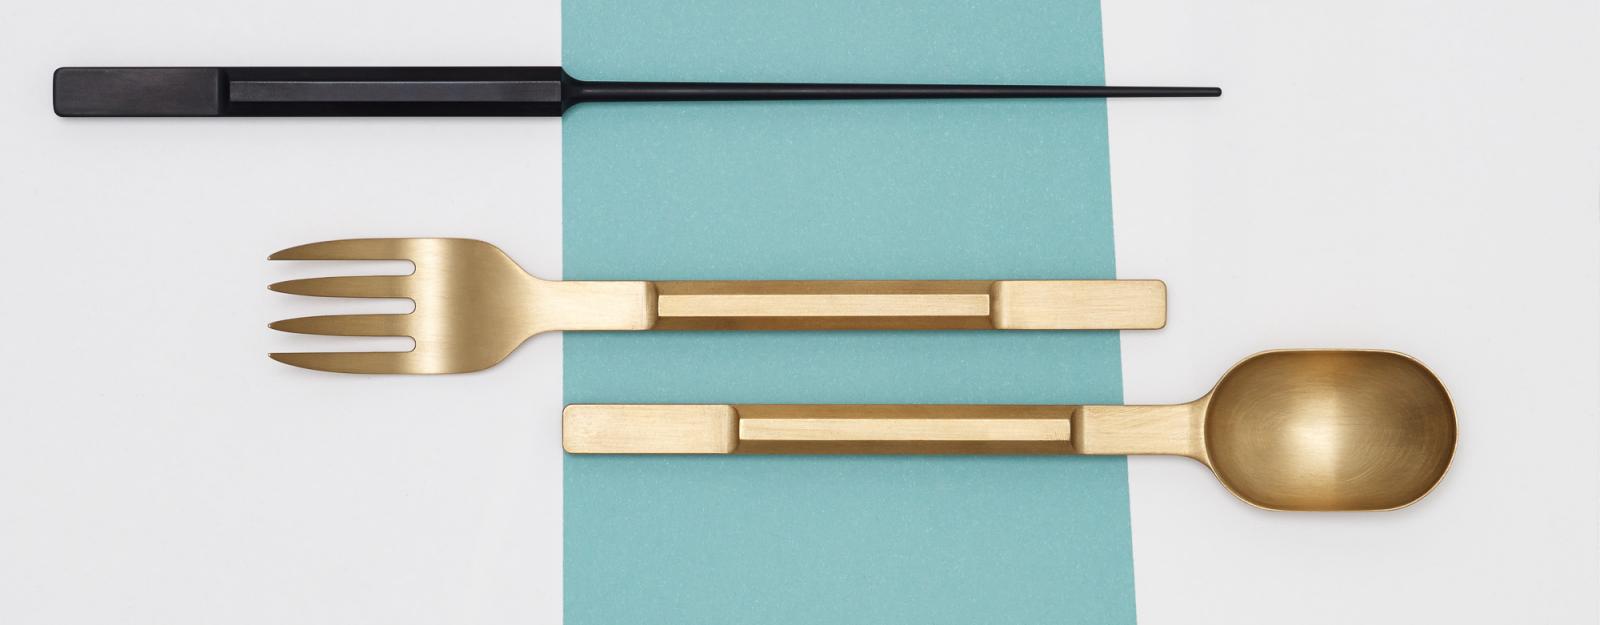 Creative Cutlery by Maarten Baas and Koichi Futasumata - Core77